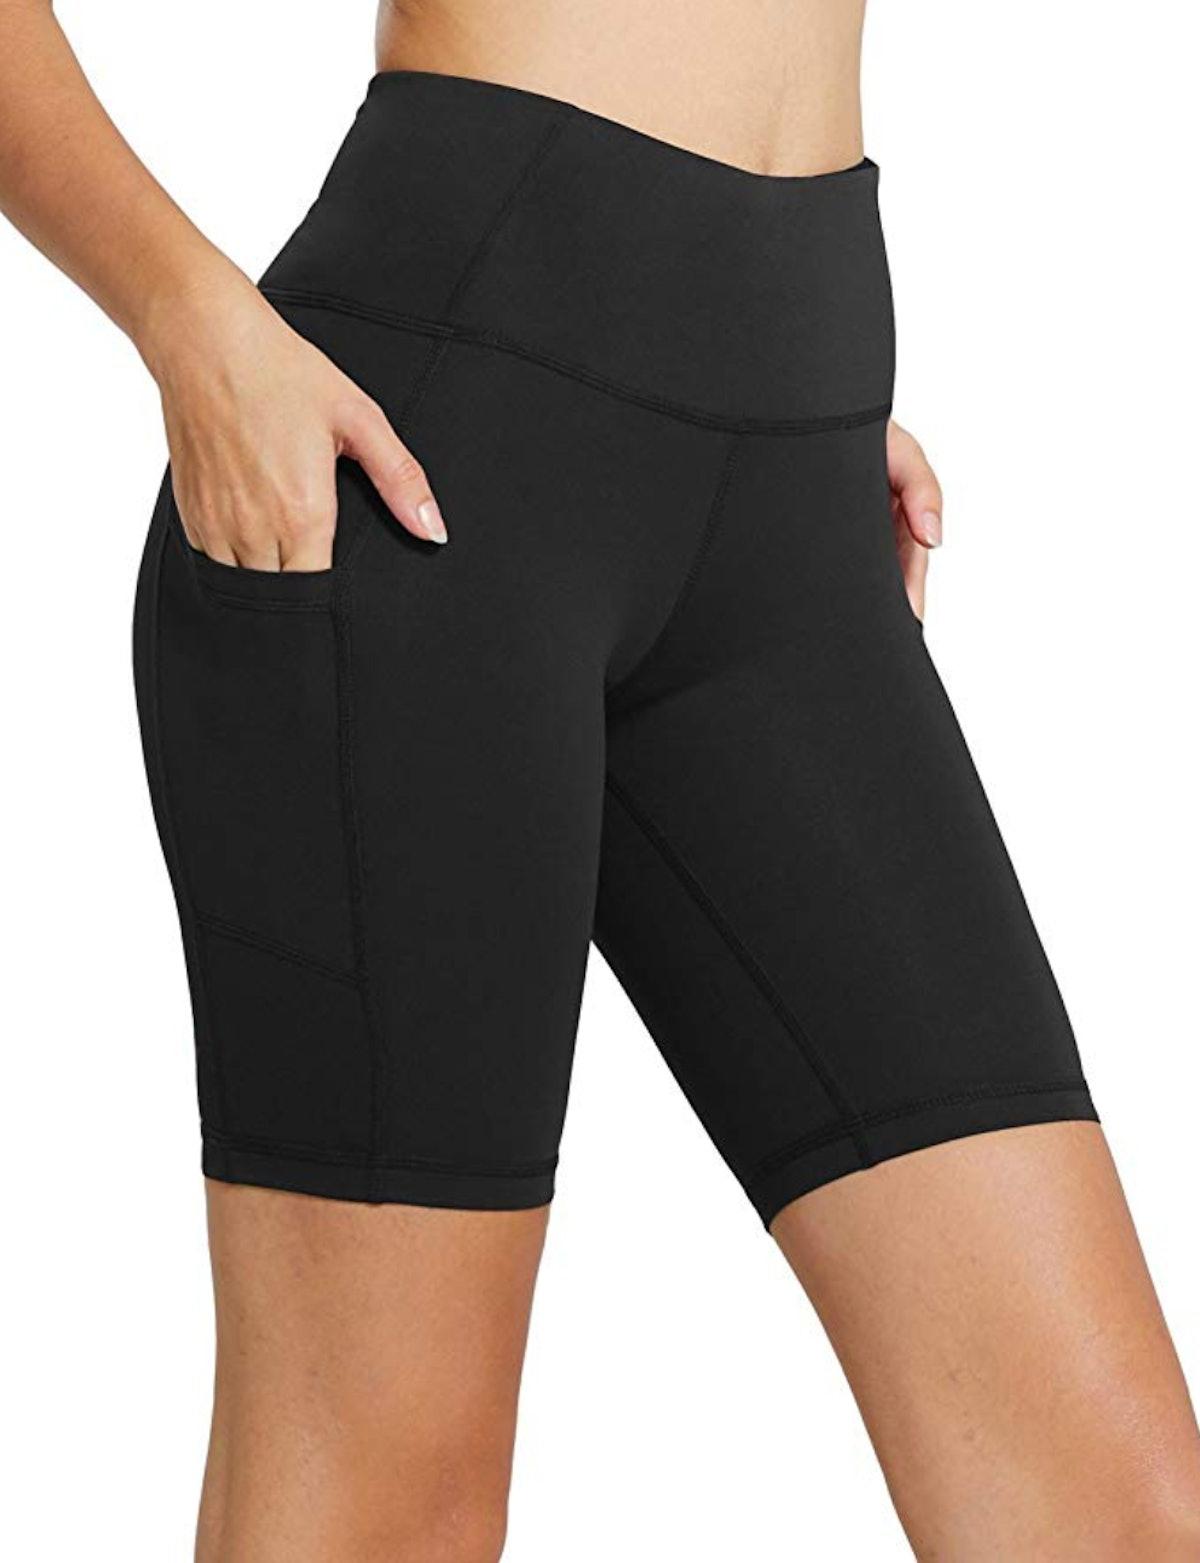 "BALEAF Women's 8"" /5"" /2"" High Waist Workout Yoga Running Compression Shorts Tummy Control Side Pock..."